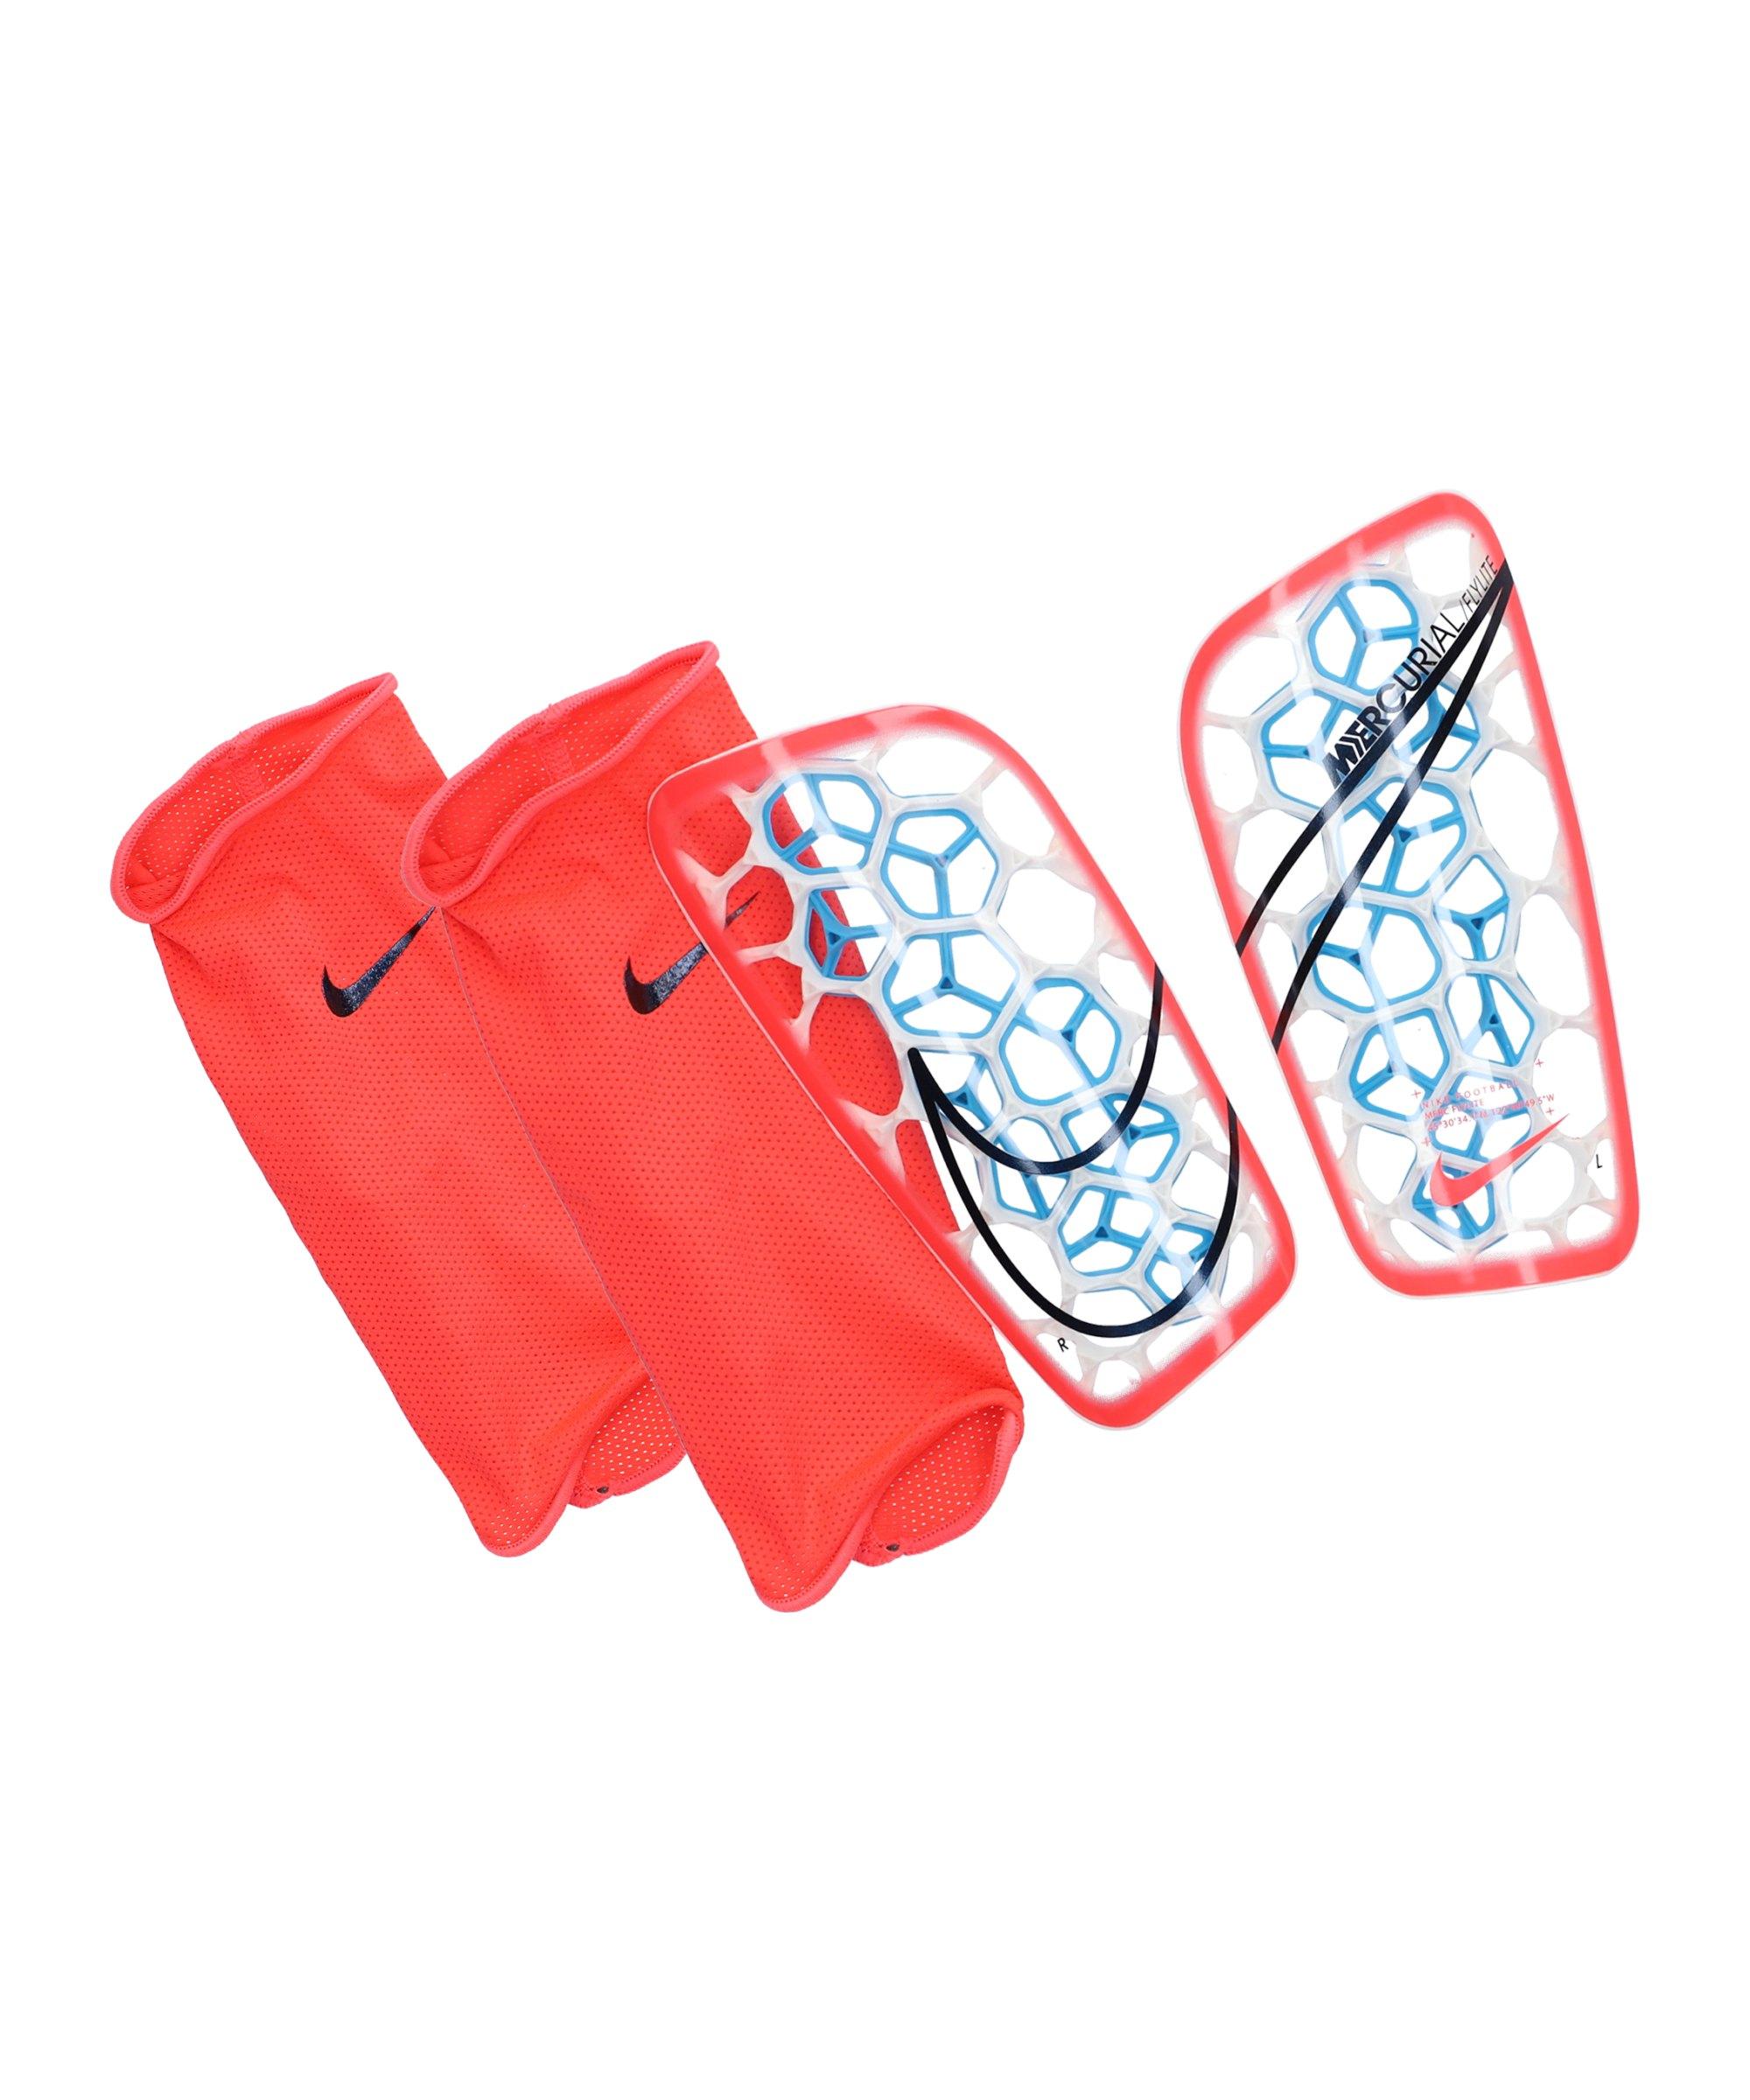 Nike Mercurial Flylite PROMO-FA19 Schoner F644 - rot